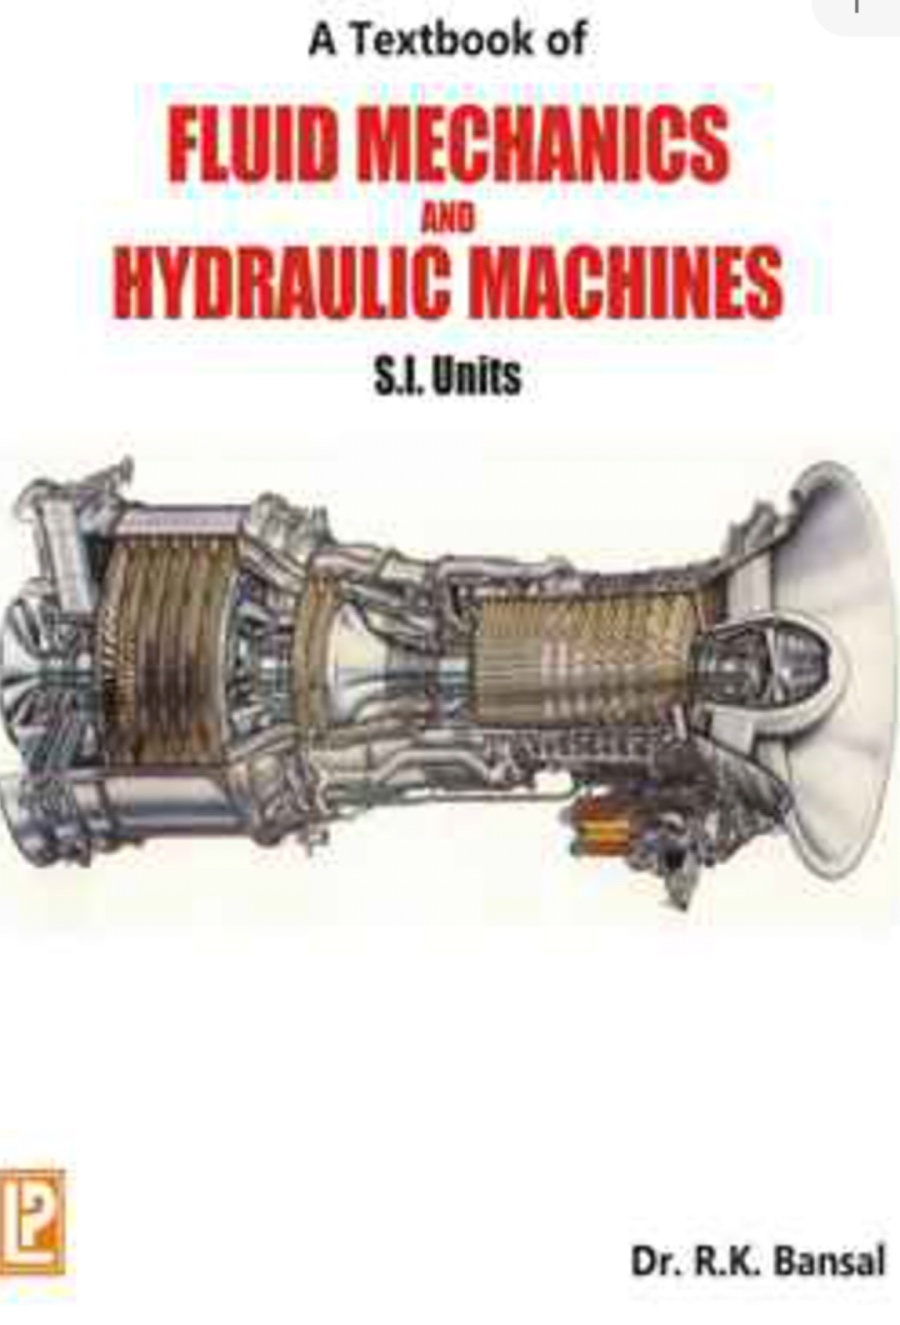 motor vehicle mechanics books pdf free download